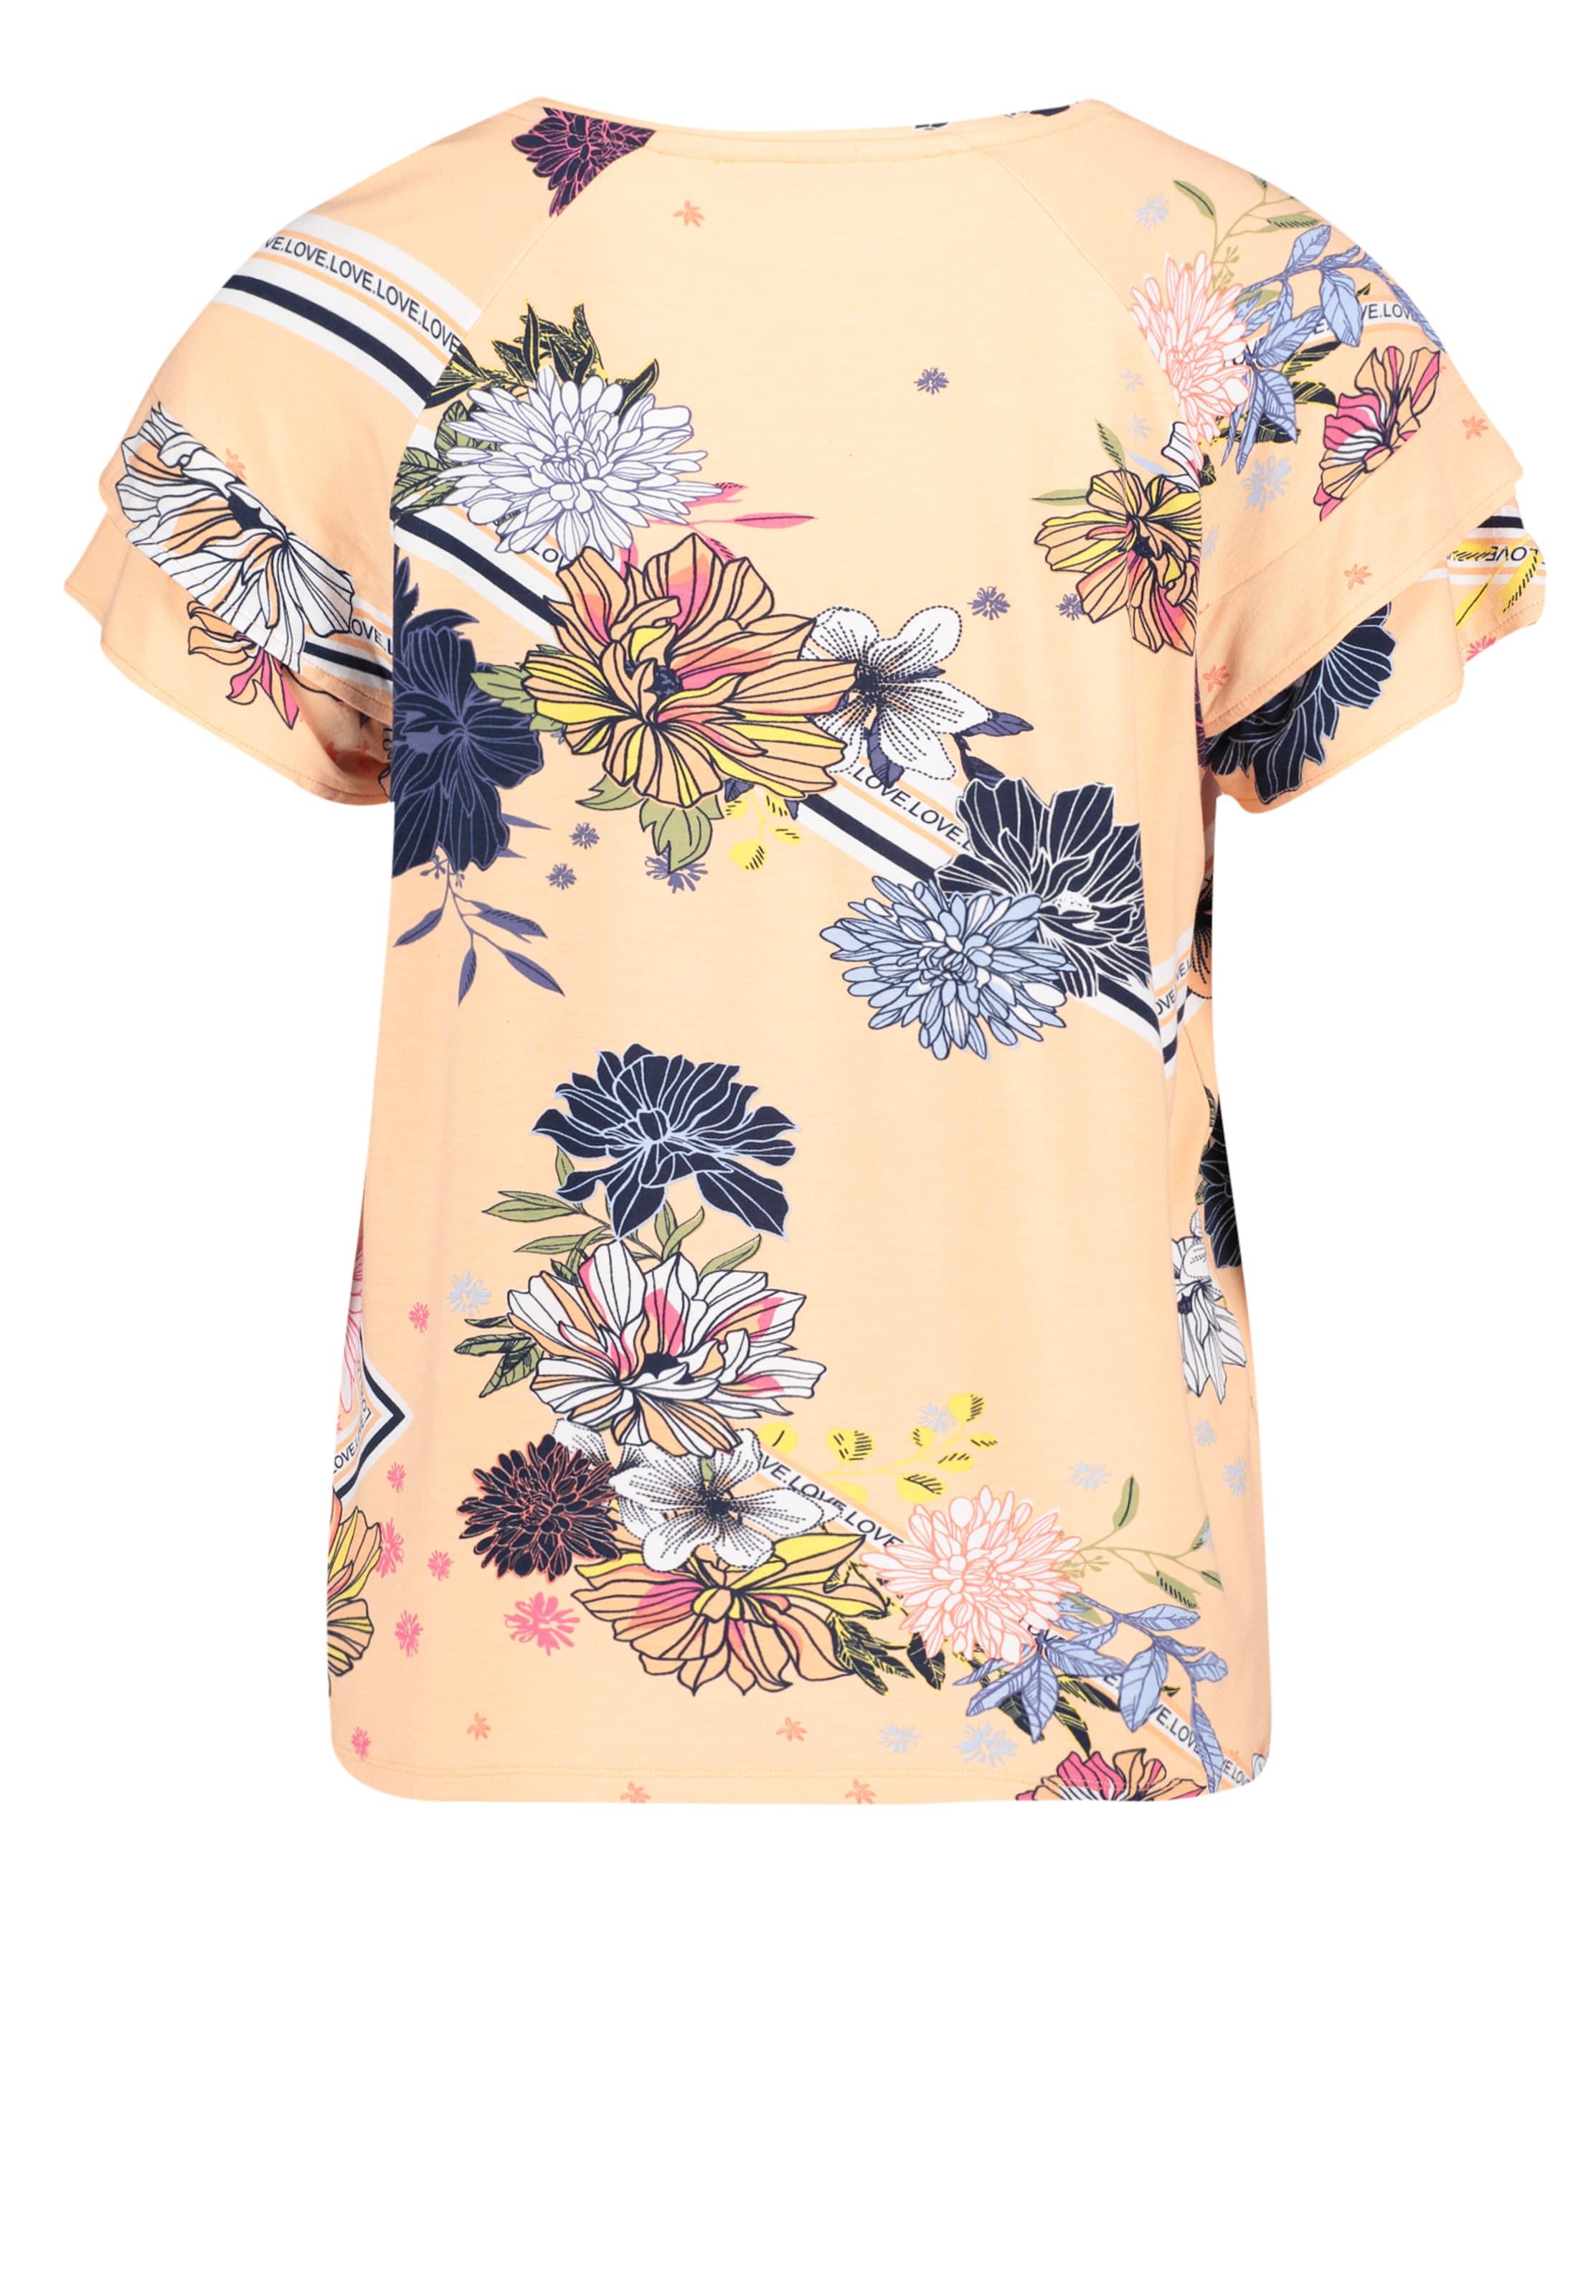 Bettyamp; Shirt MischfarbenApricot Bettyamp; MischfarbenApricot Co In In Bettyamp; Co Shirt dQrsht